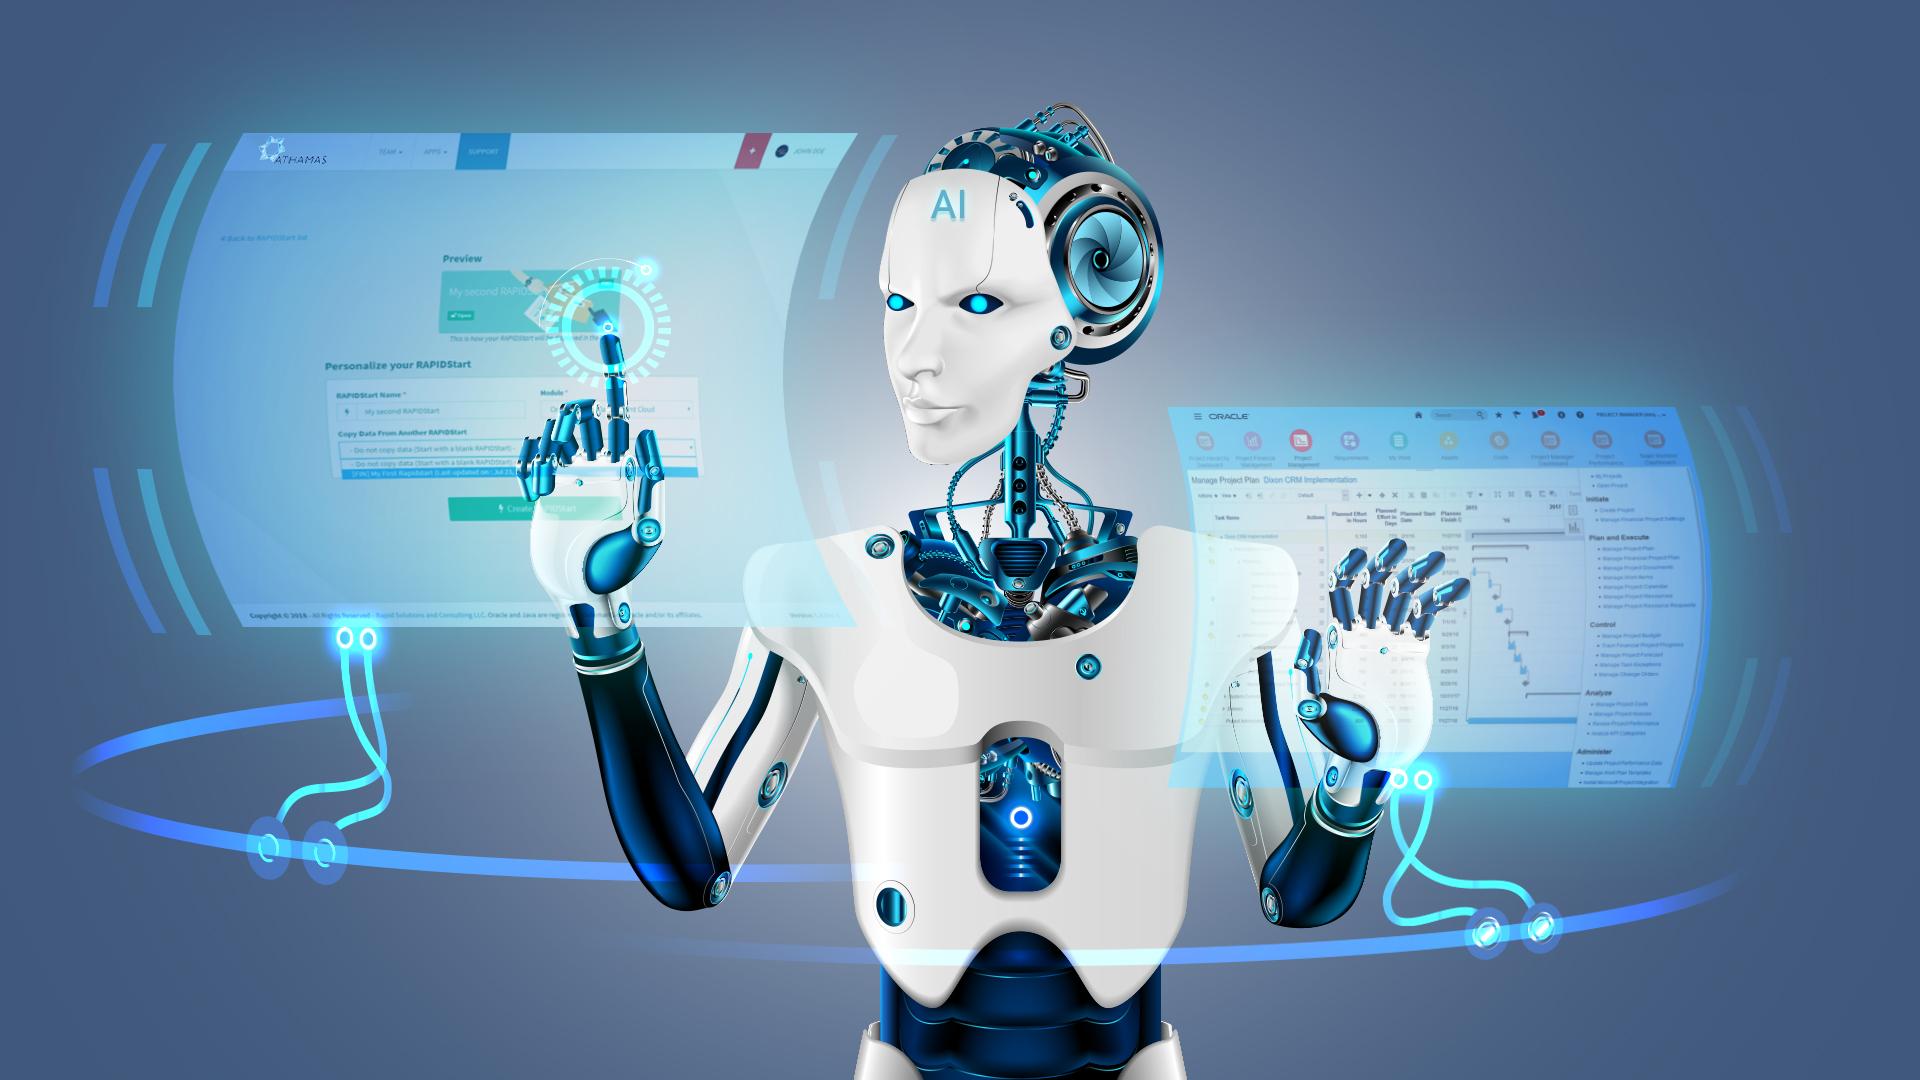 RPA : Robotics Process Automation